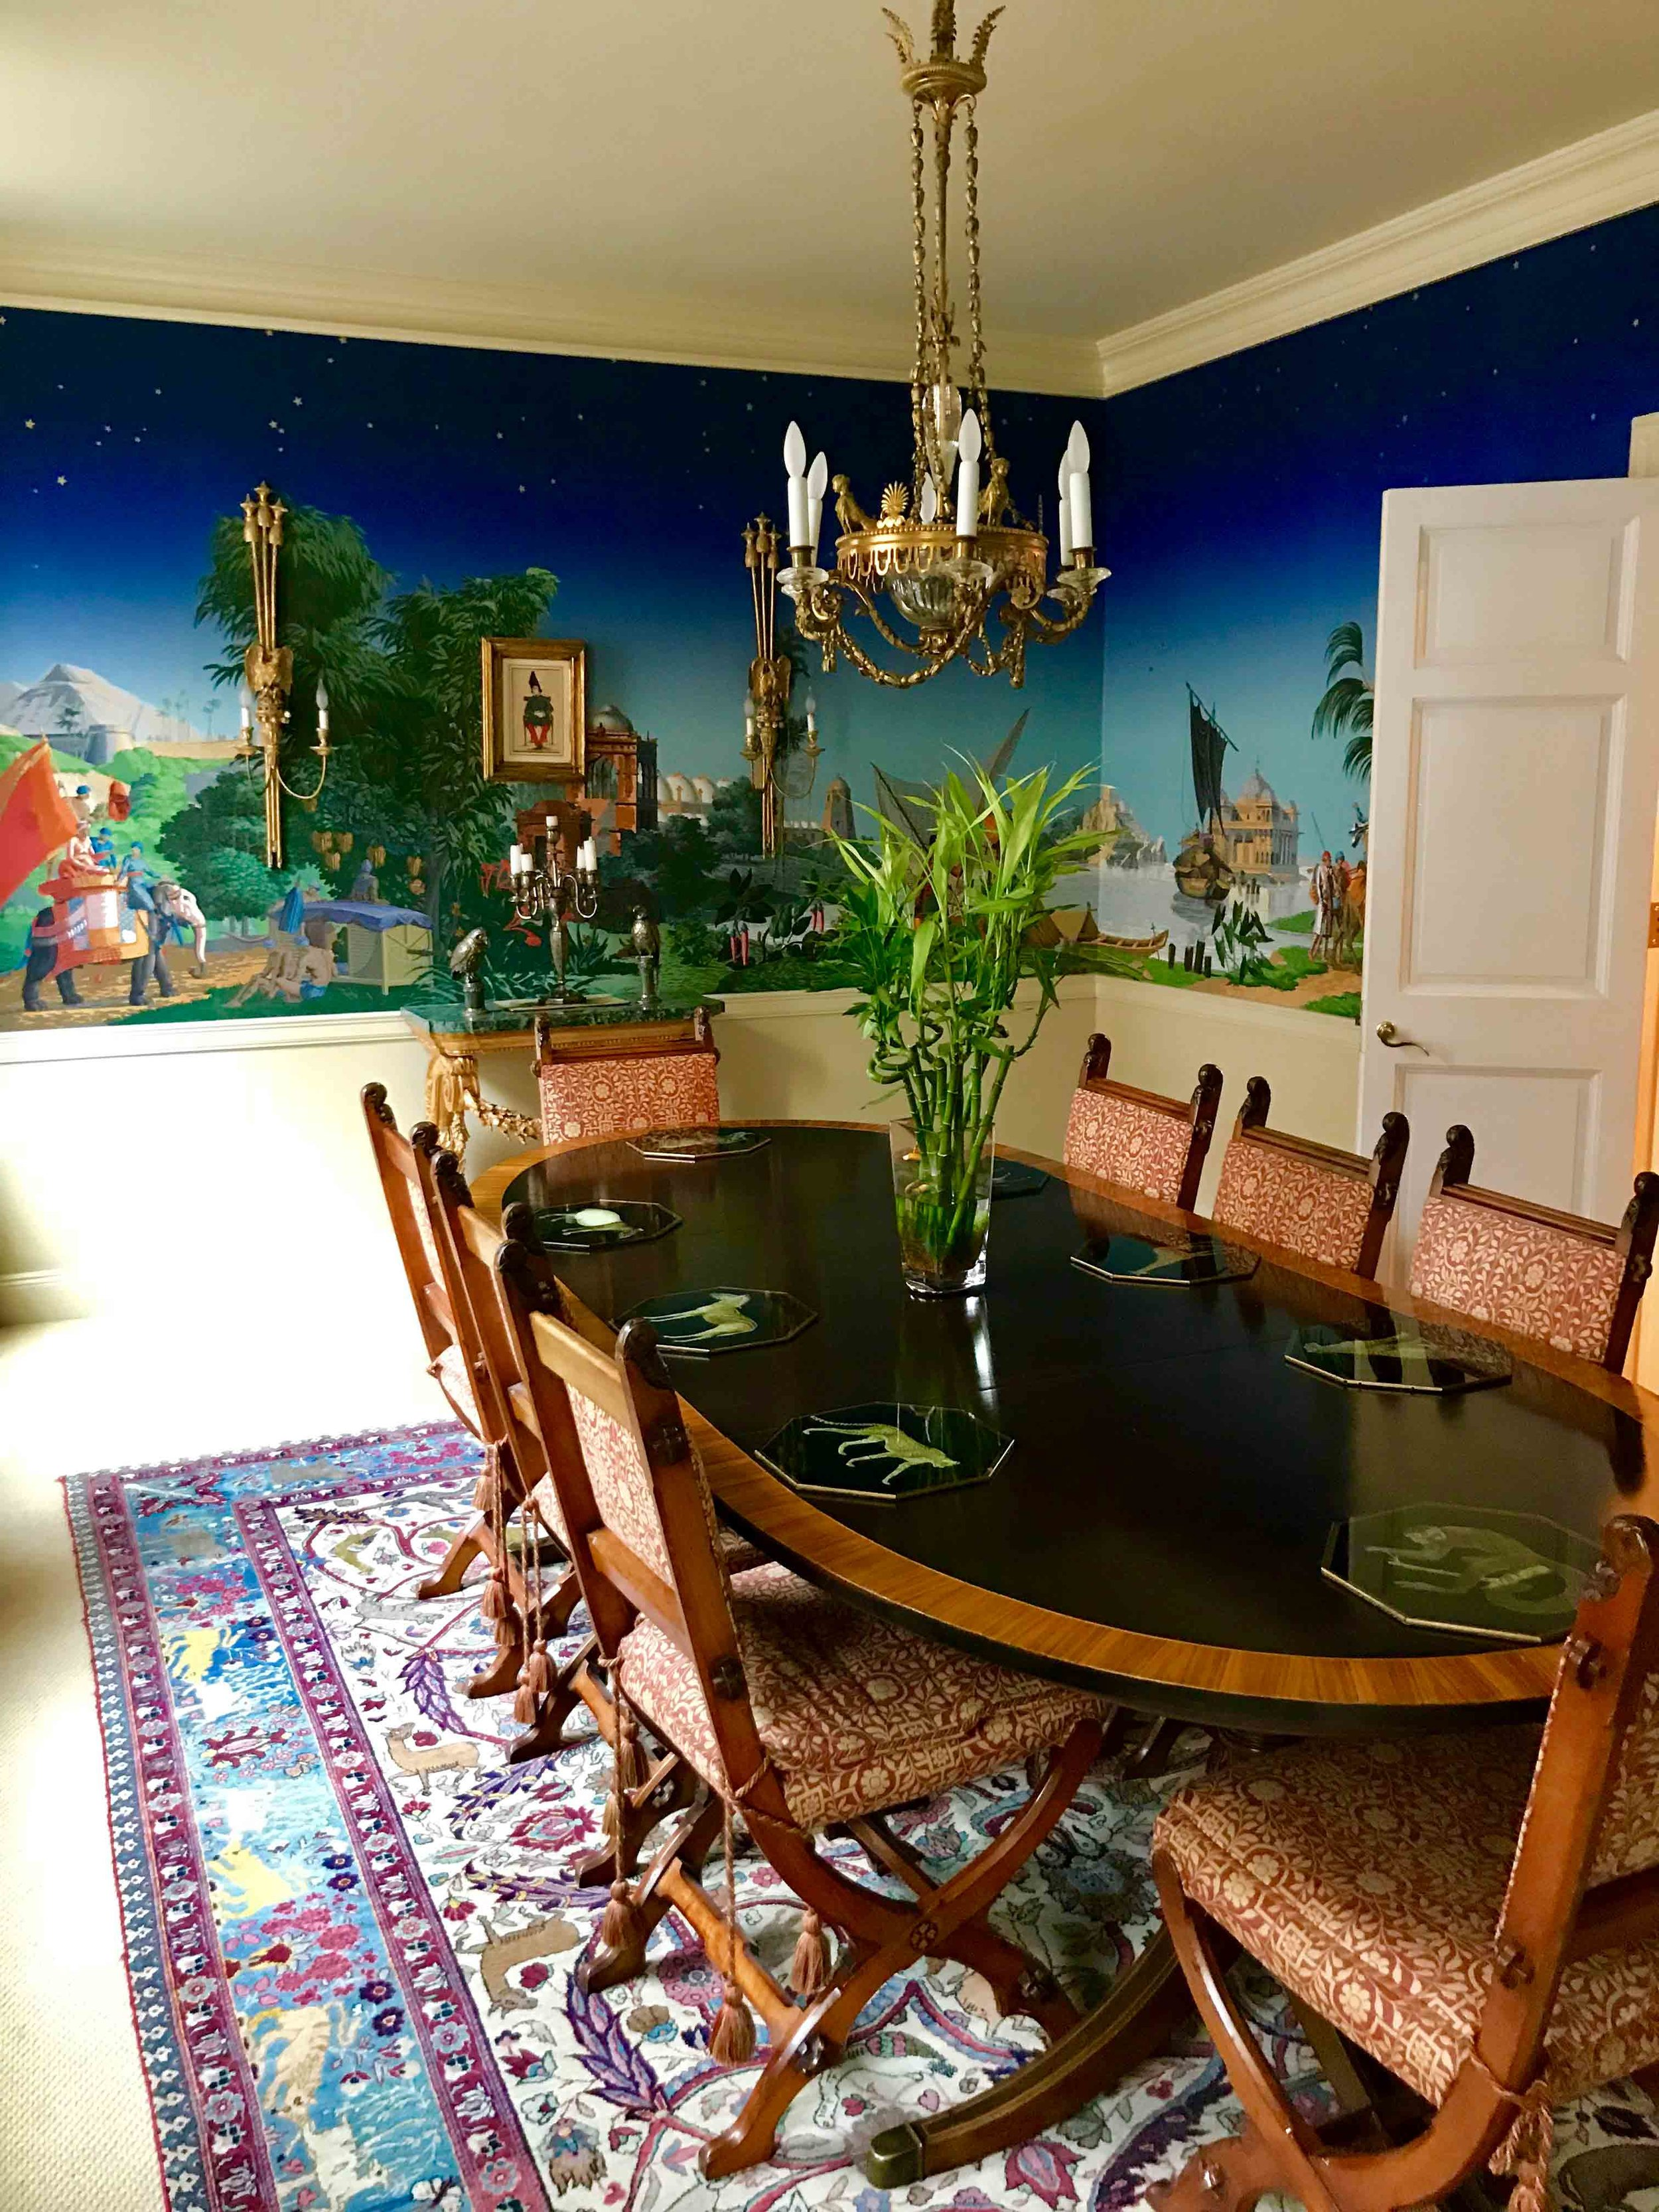 WANBOLD-dinning-room.jpg